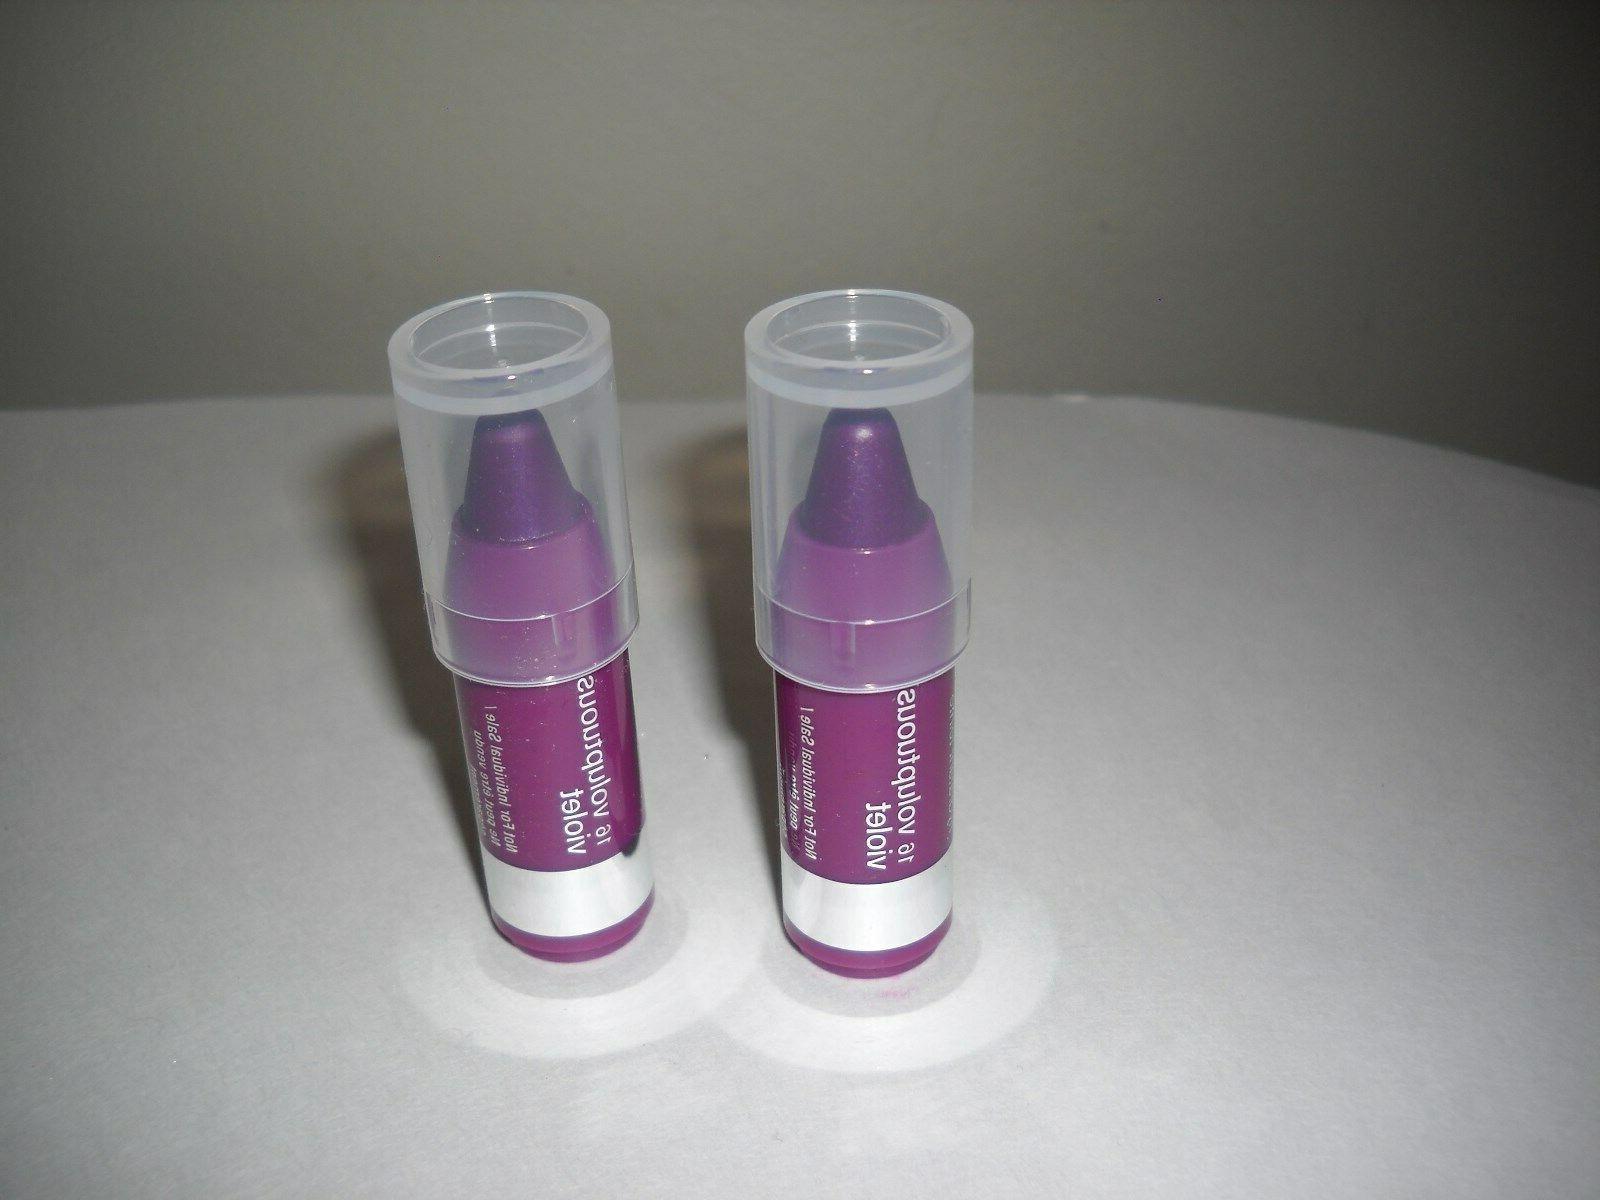 2 chubby stick moisturizing colour lip balm